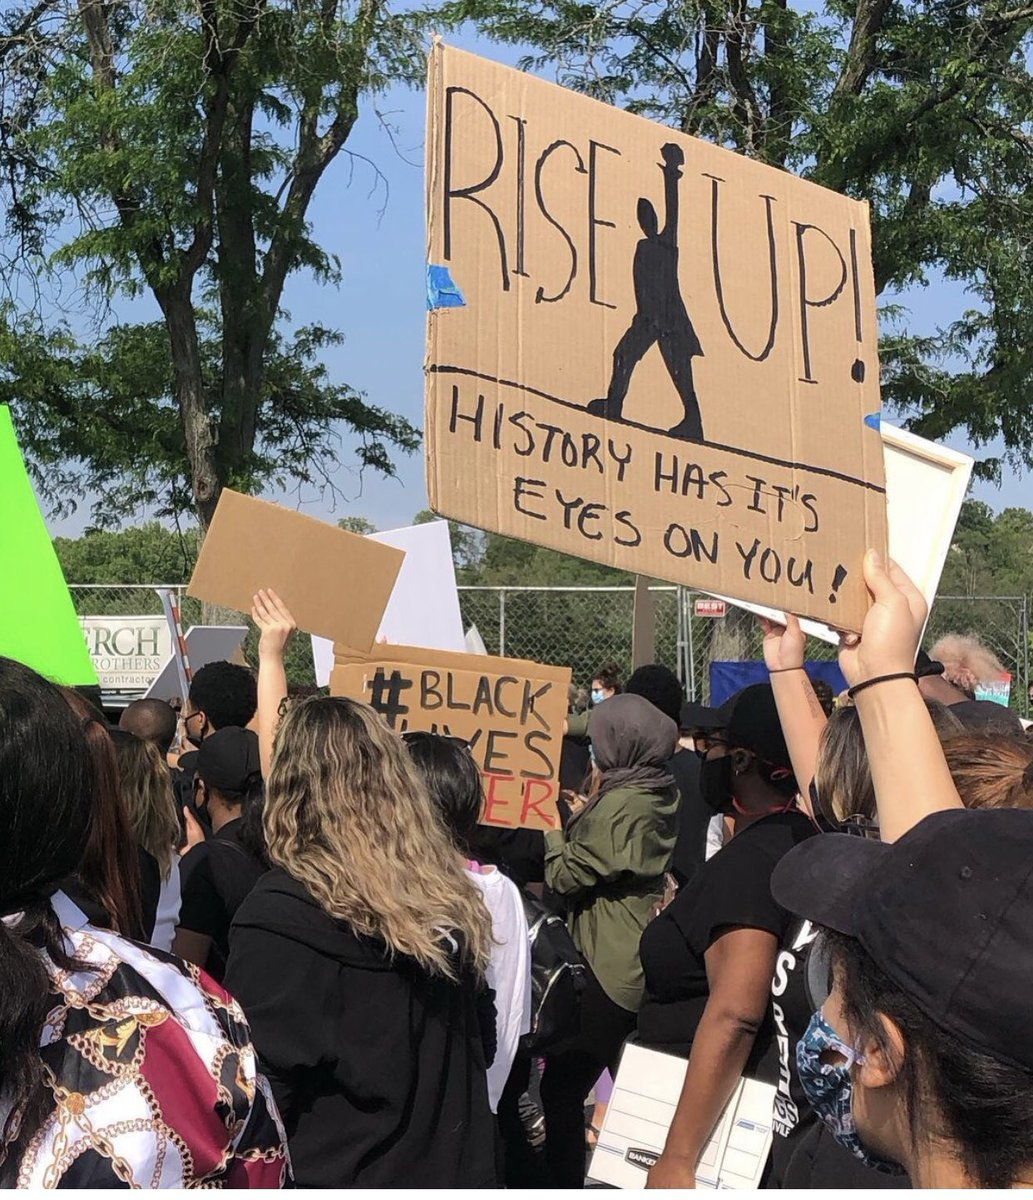 #BLM protest in Columbia MD summer 2020 #BlackLivesMatter #BidenHarrisInauguration